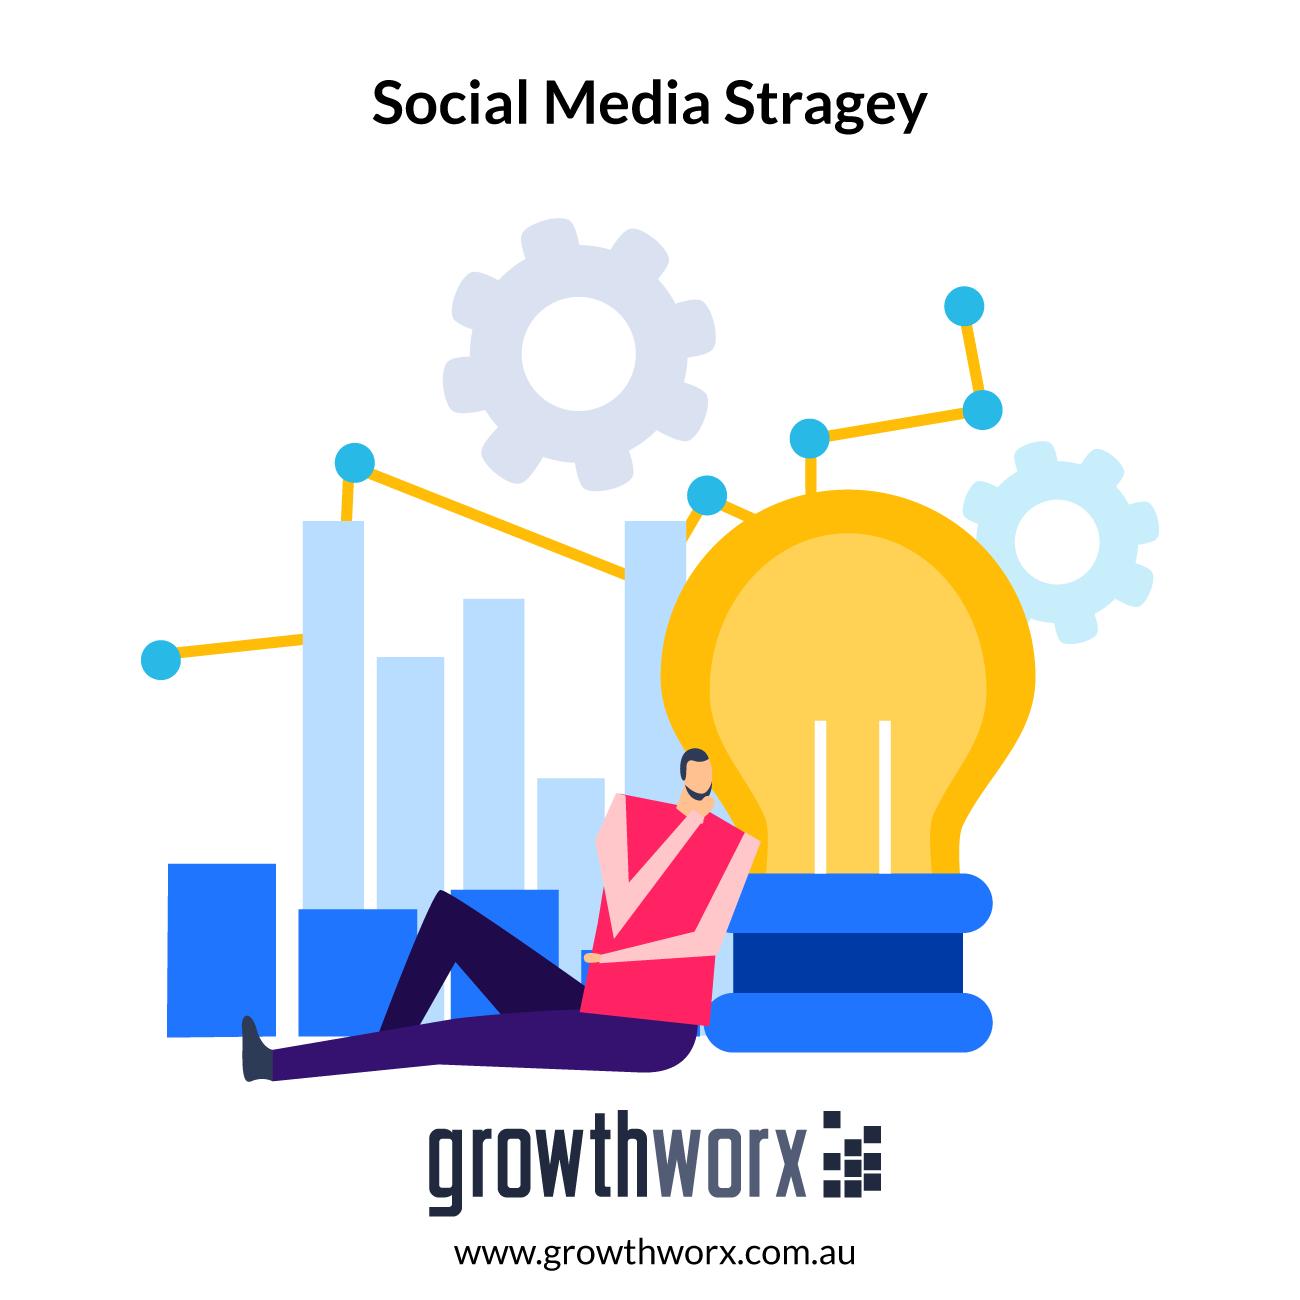 Create a basic social media stragey for start up businesses based on your goals 1